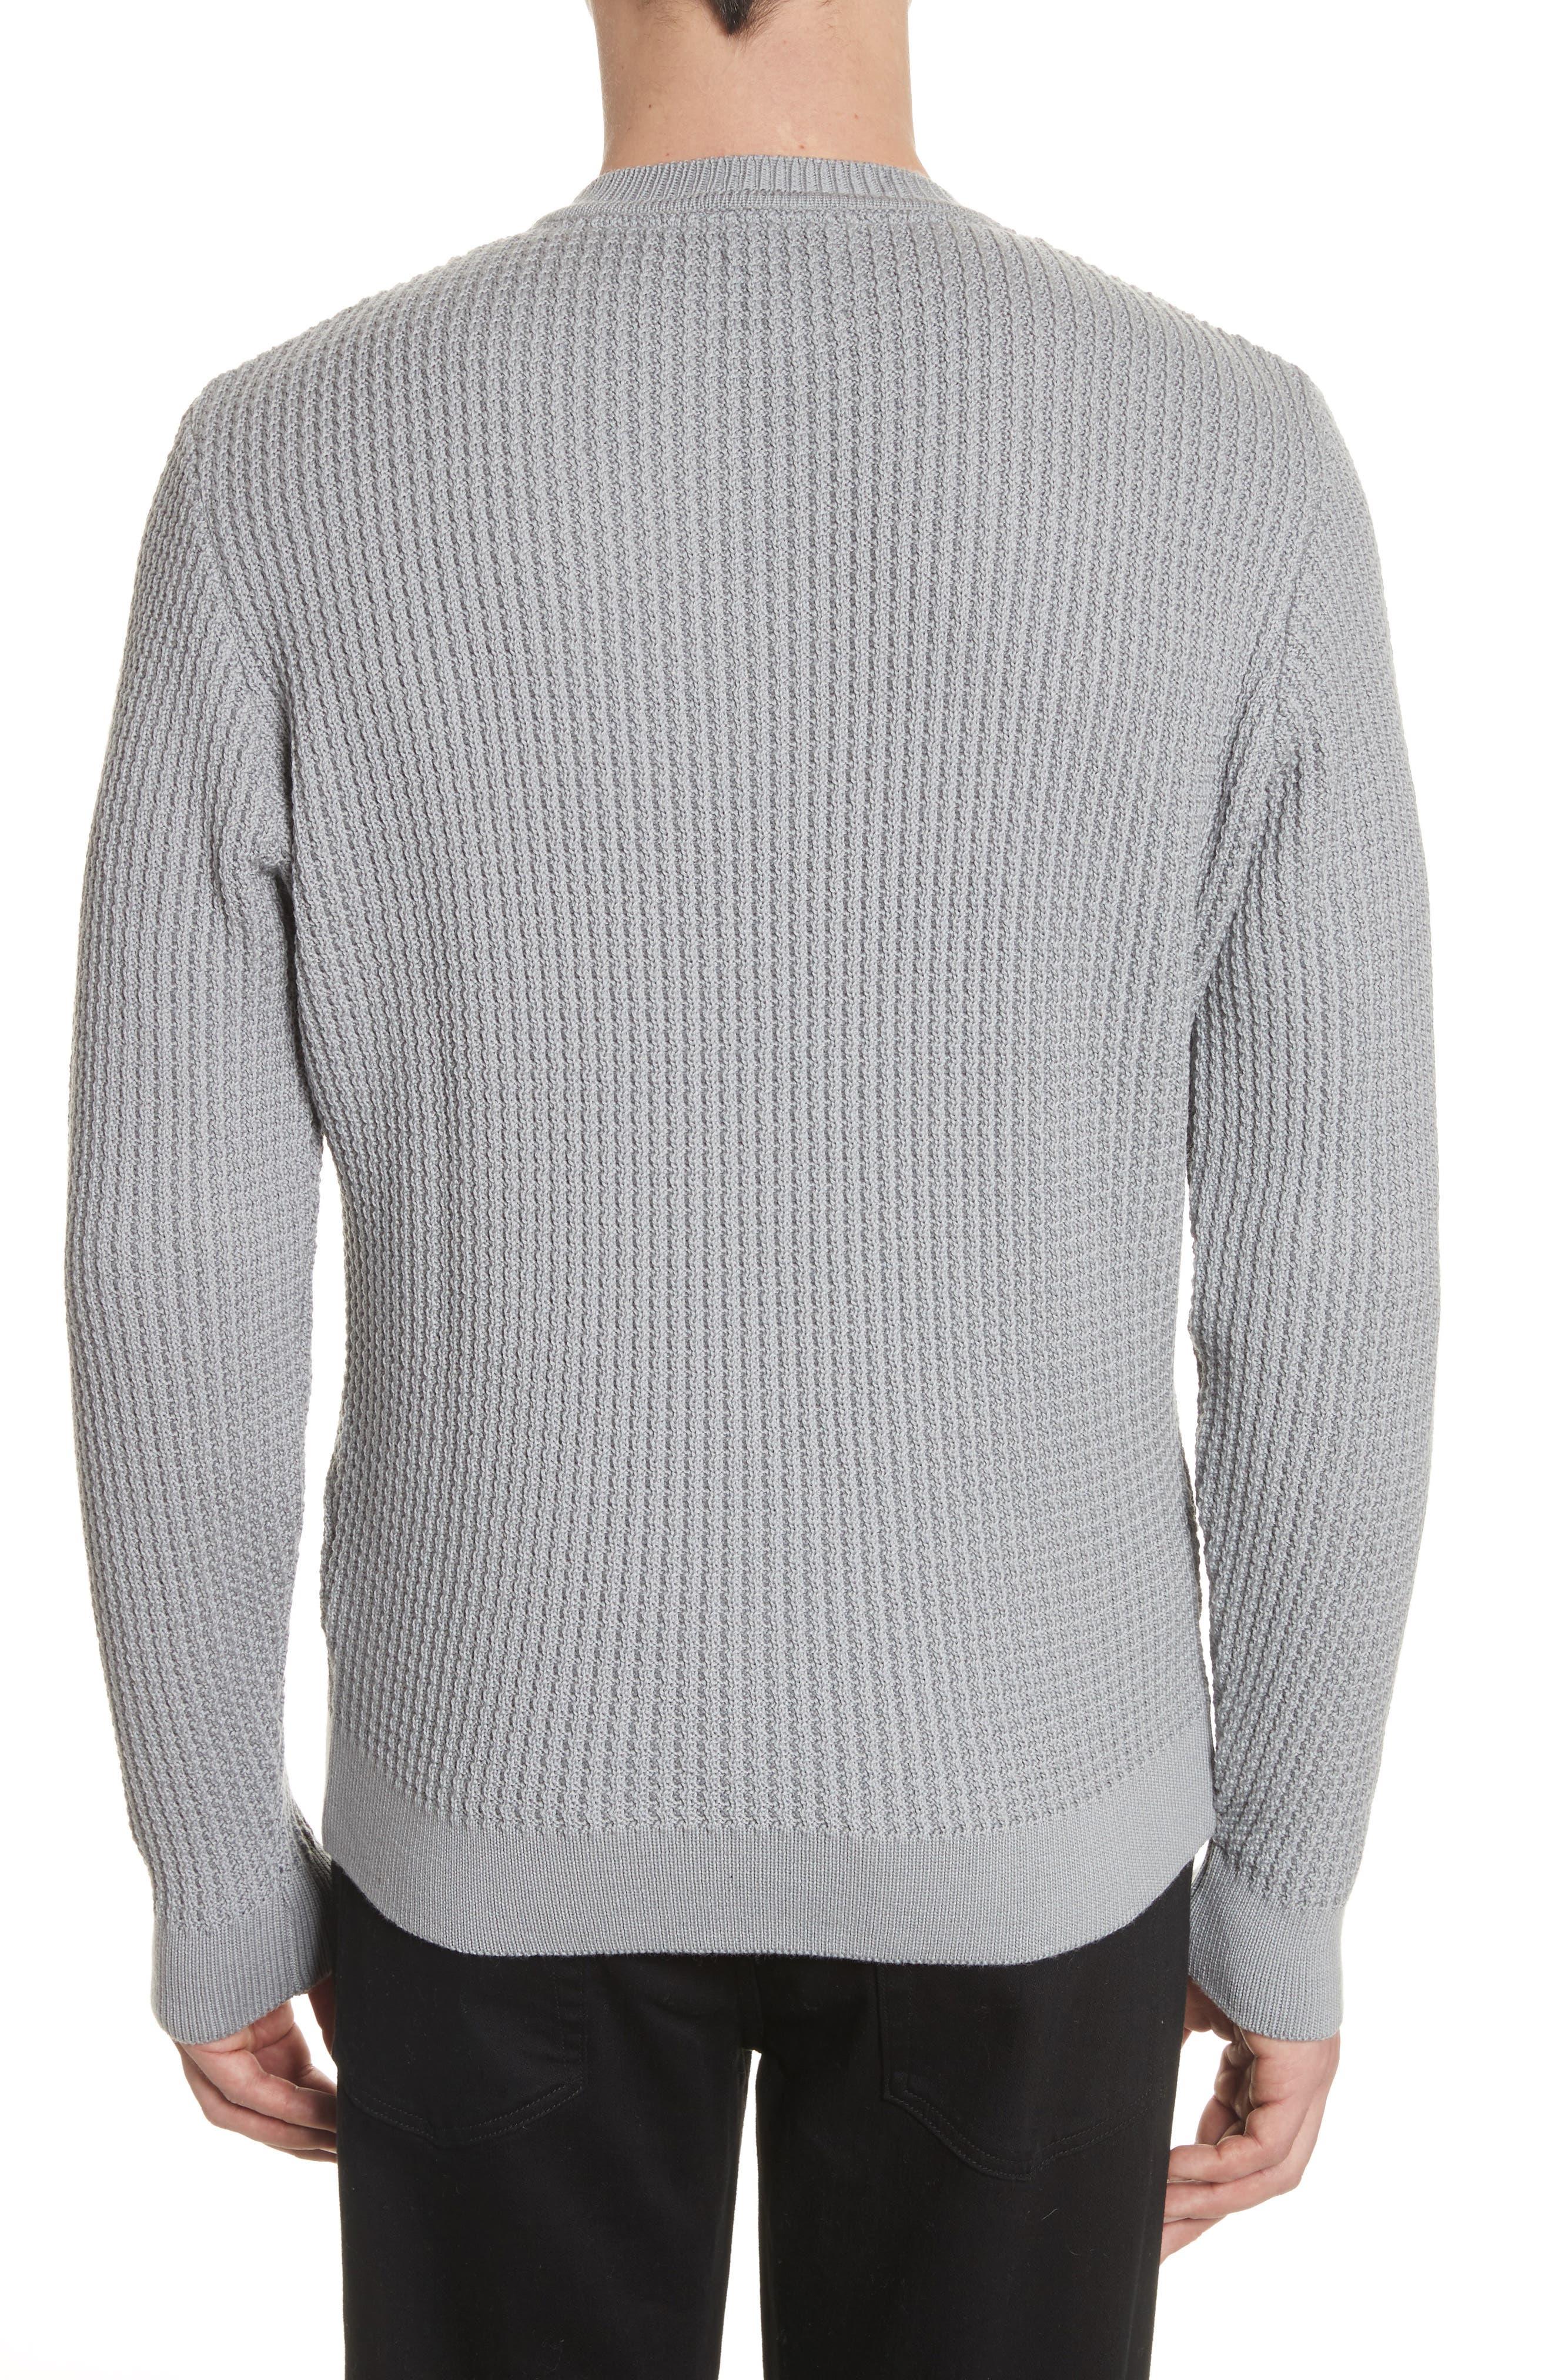 Sigfred Merino Wool Sweater,                             Alternate thumbnail 2, color,                             025